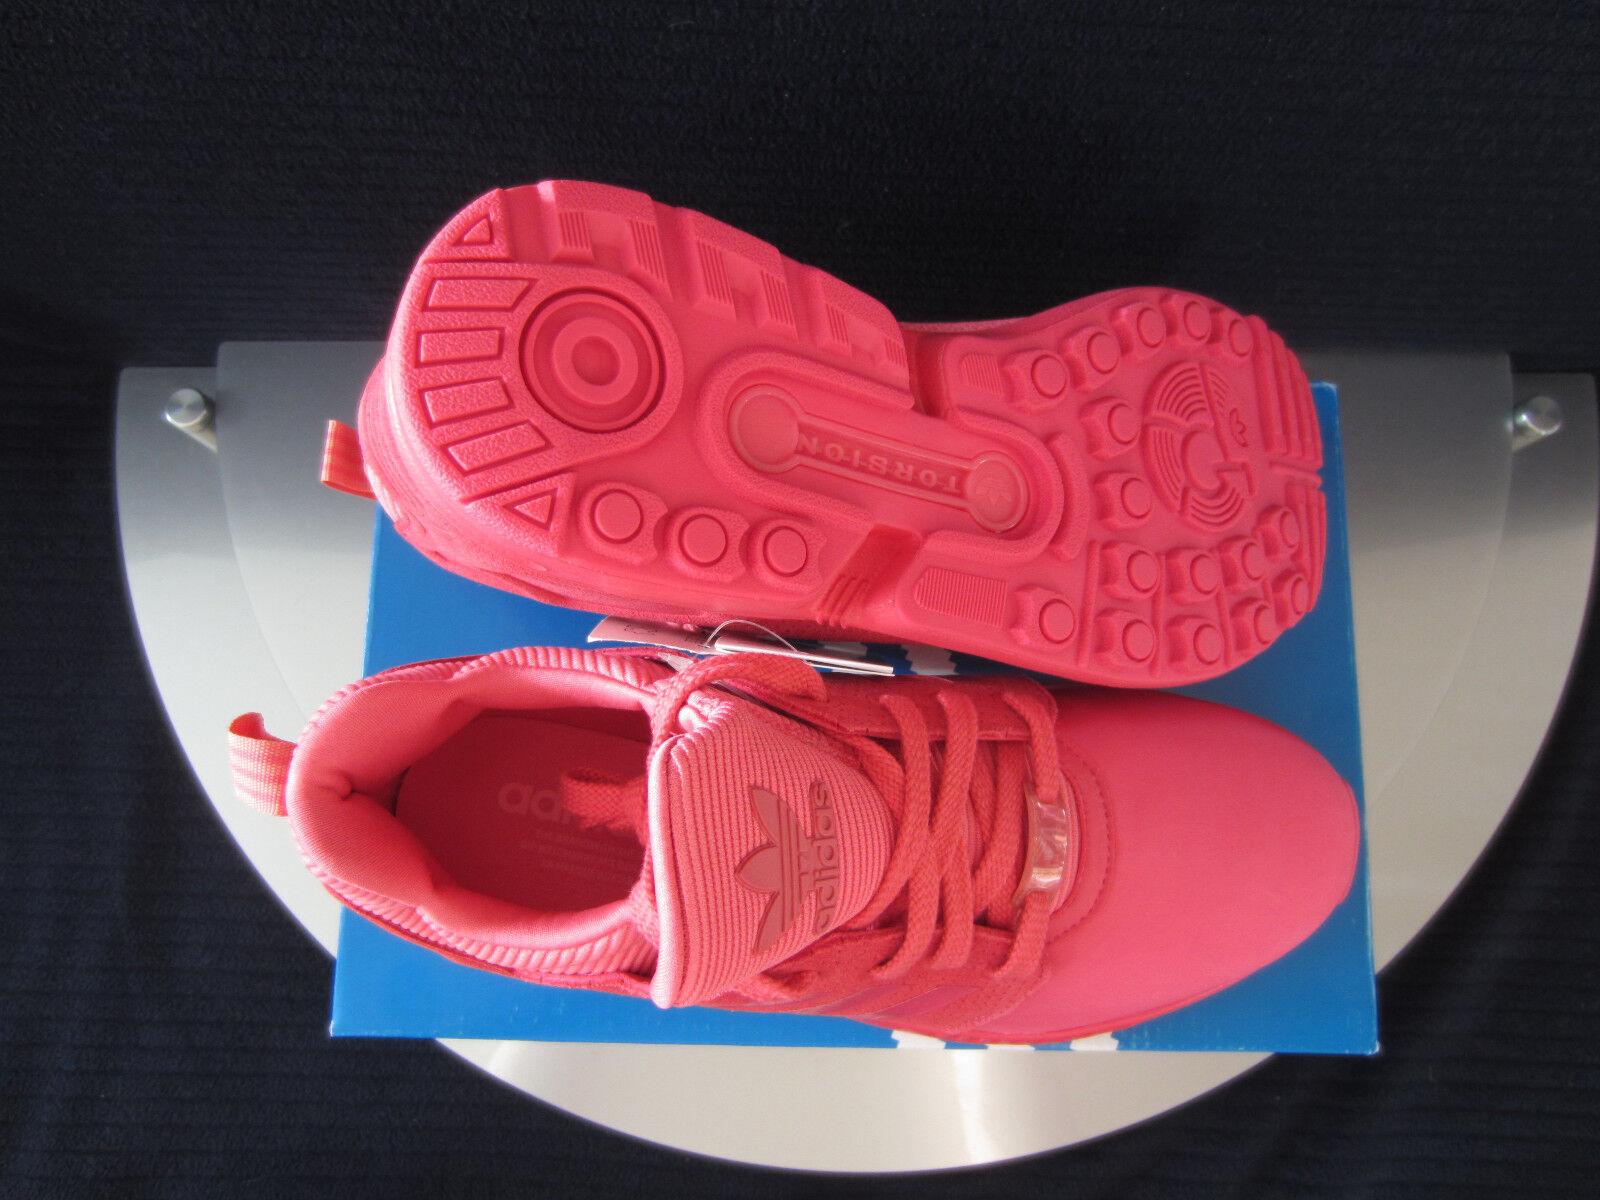 Adidas ZX Flux NPS UPDT UPDT UPDT  Damen Sneakers Pink Gr.38 2/3, 40, 44. NEU b53eb7